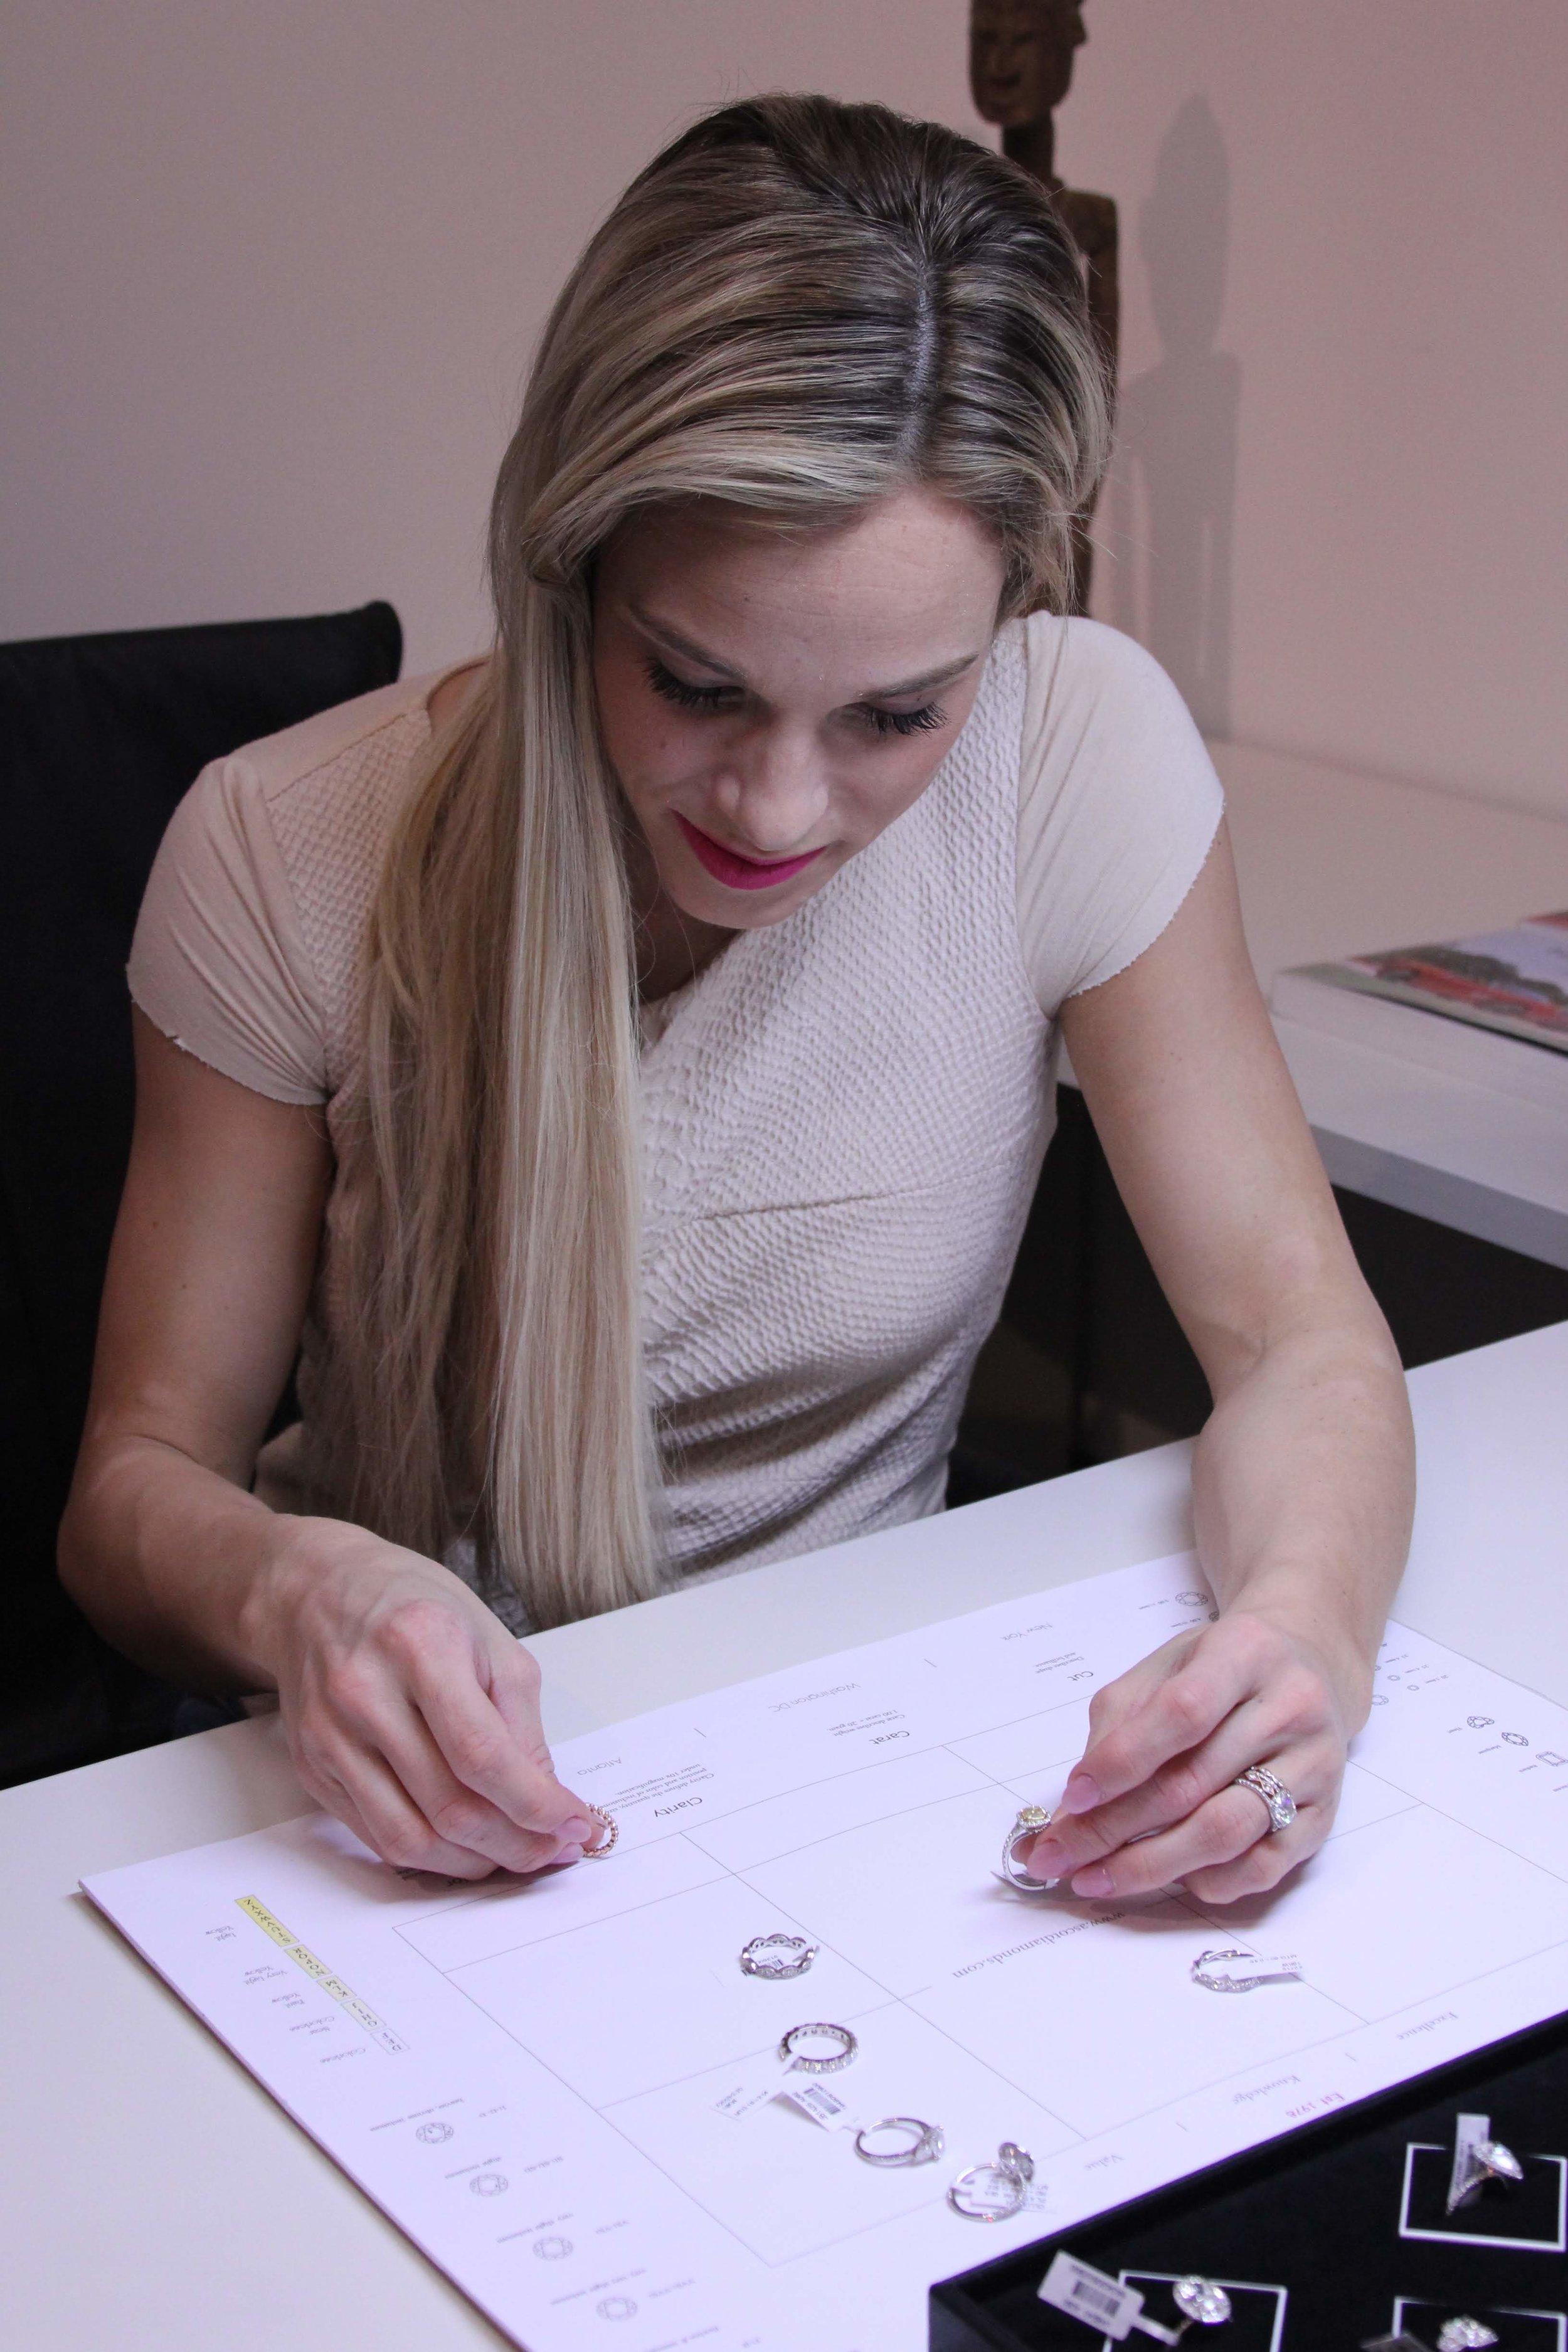 Choosing an eternity ring at Ascot Diamonds